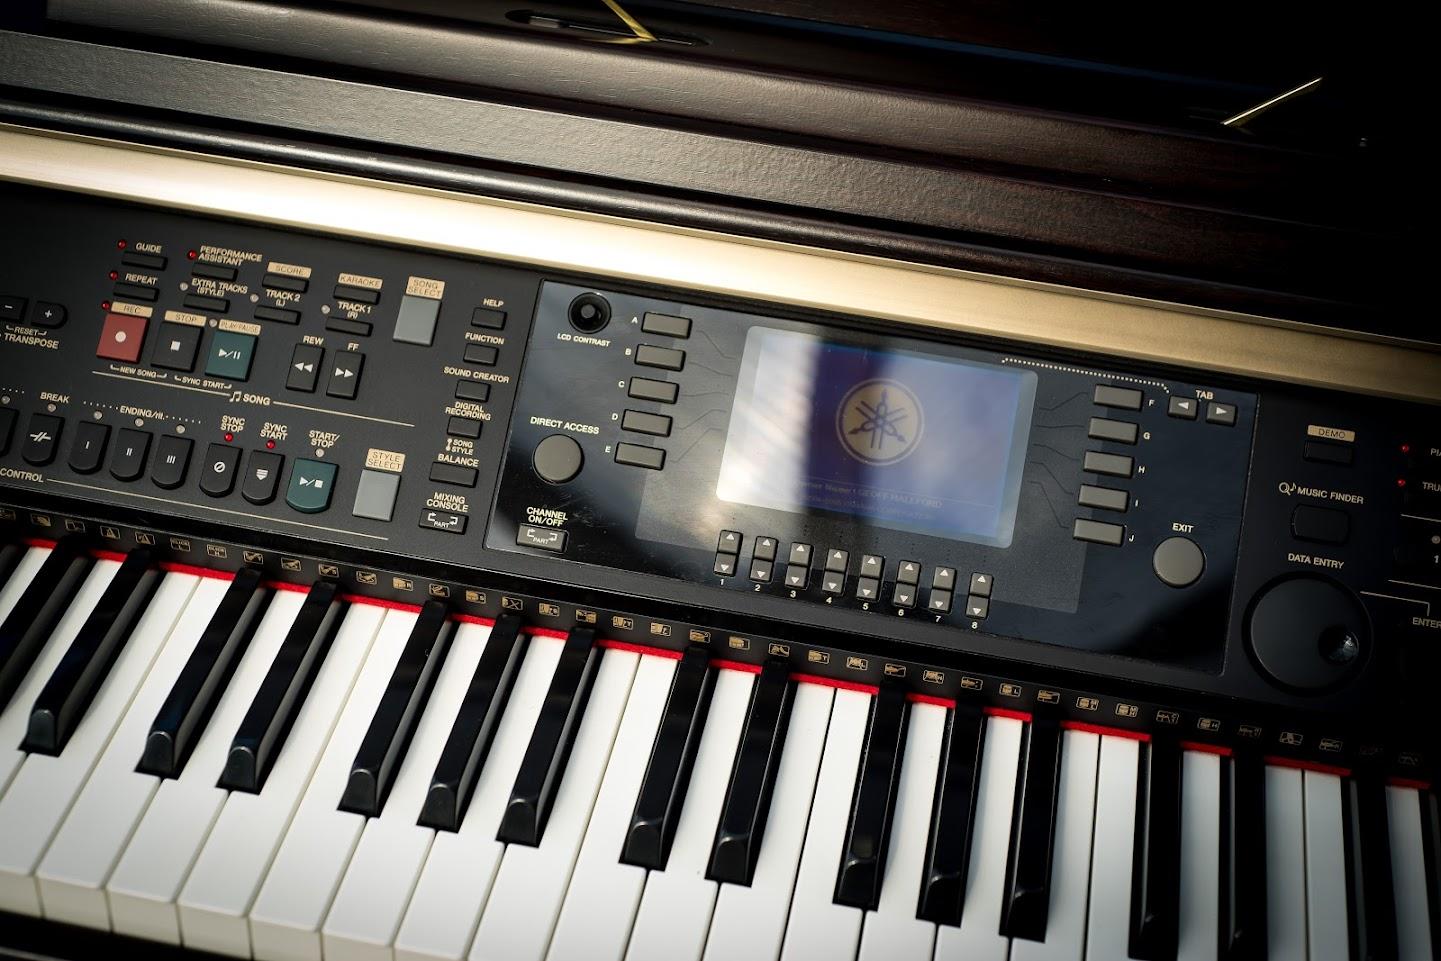 Yamaha clavinova cvp 301 digital full piano 88 key ghe for Yamaha keyboard 88 keys weighted